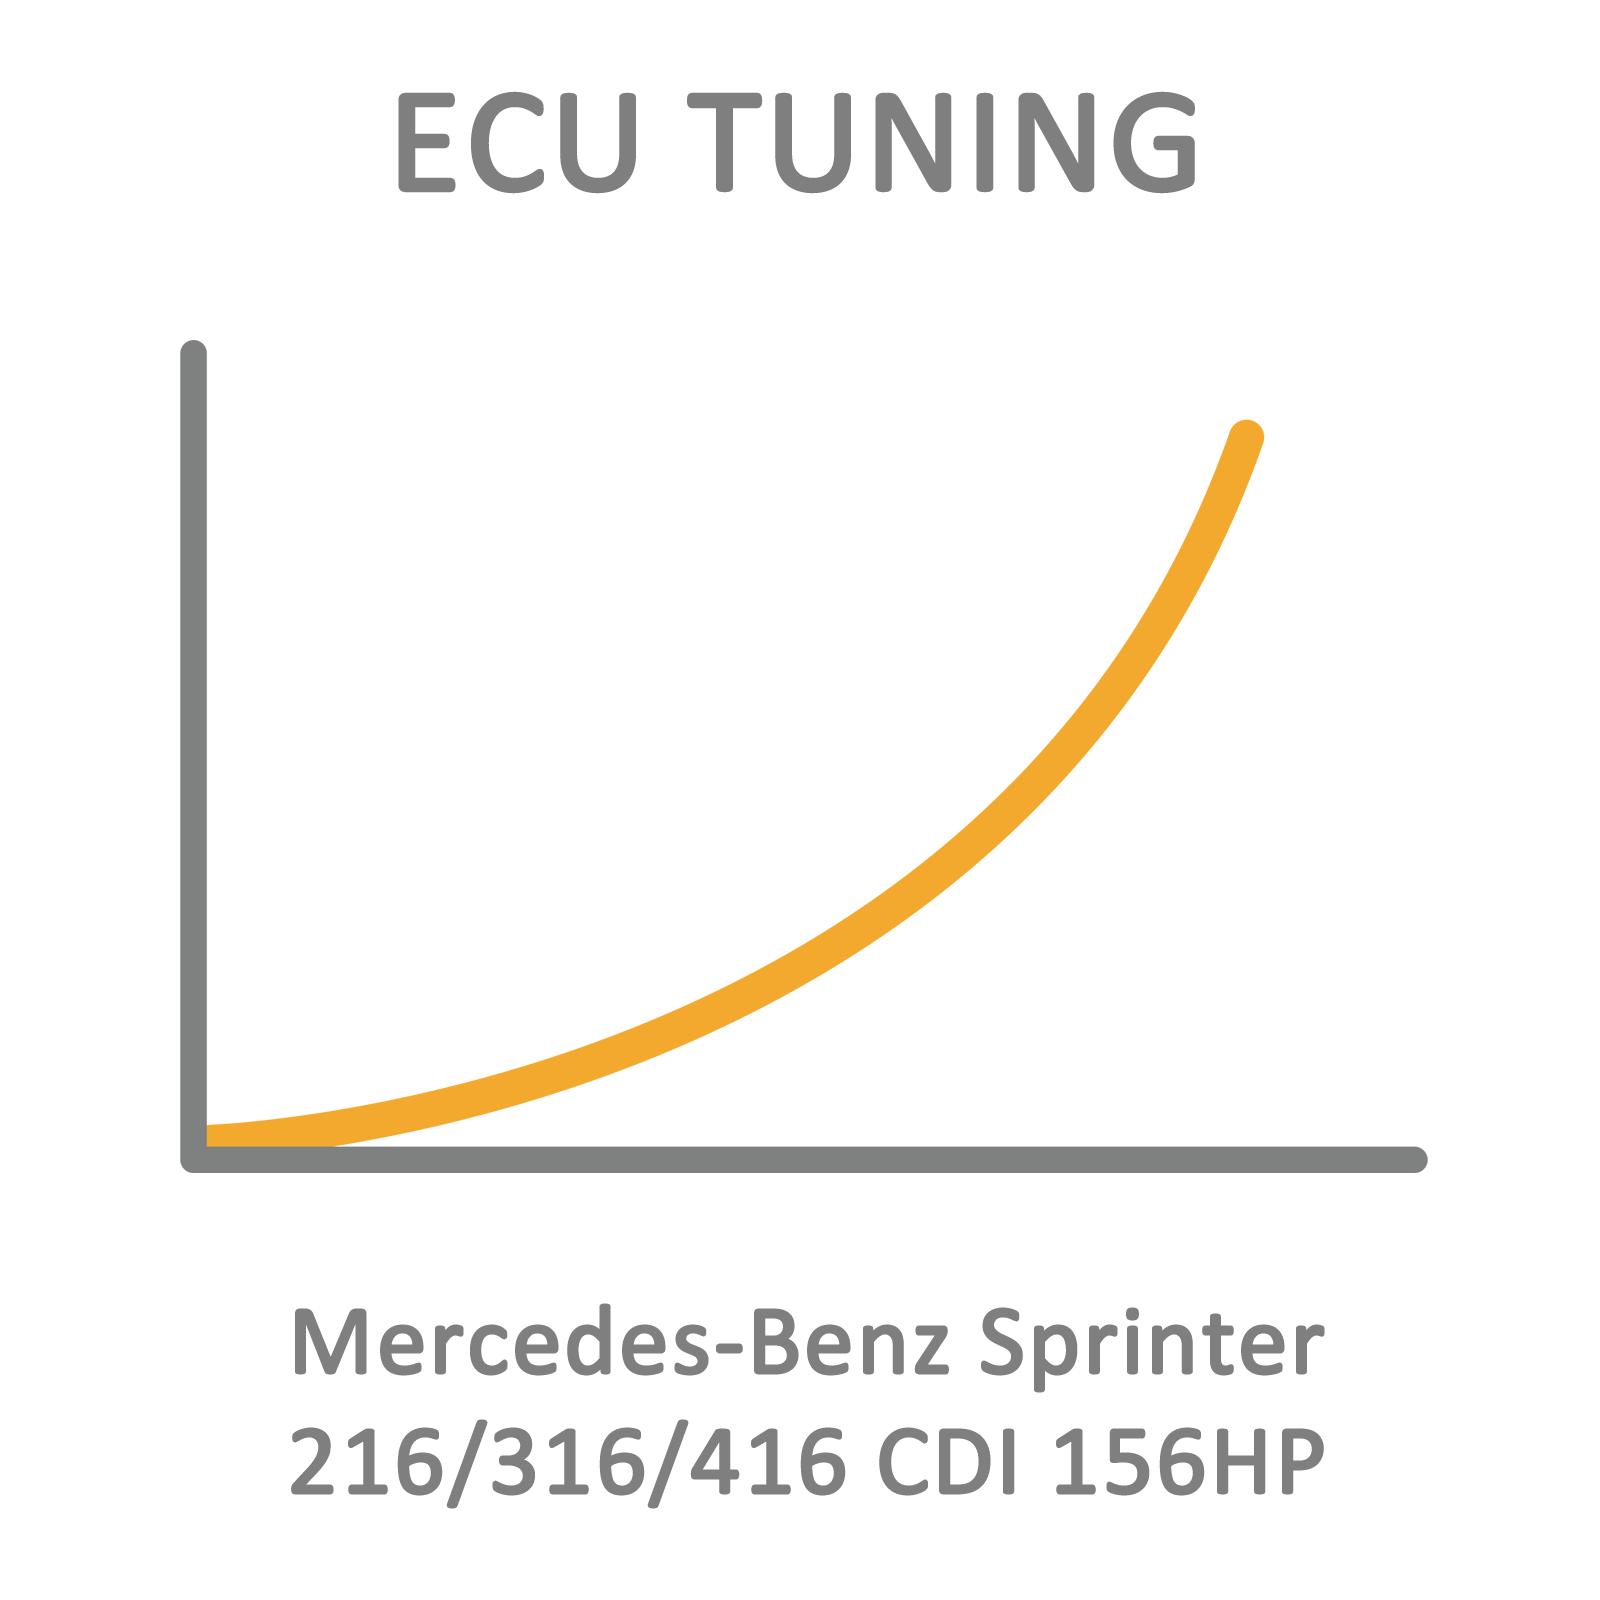 Mercedes-Benz Sprinter 216/316/416 CDI 156HP ECU Tuning